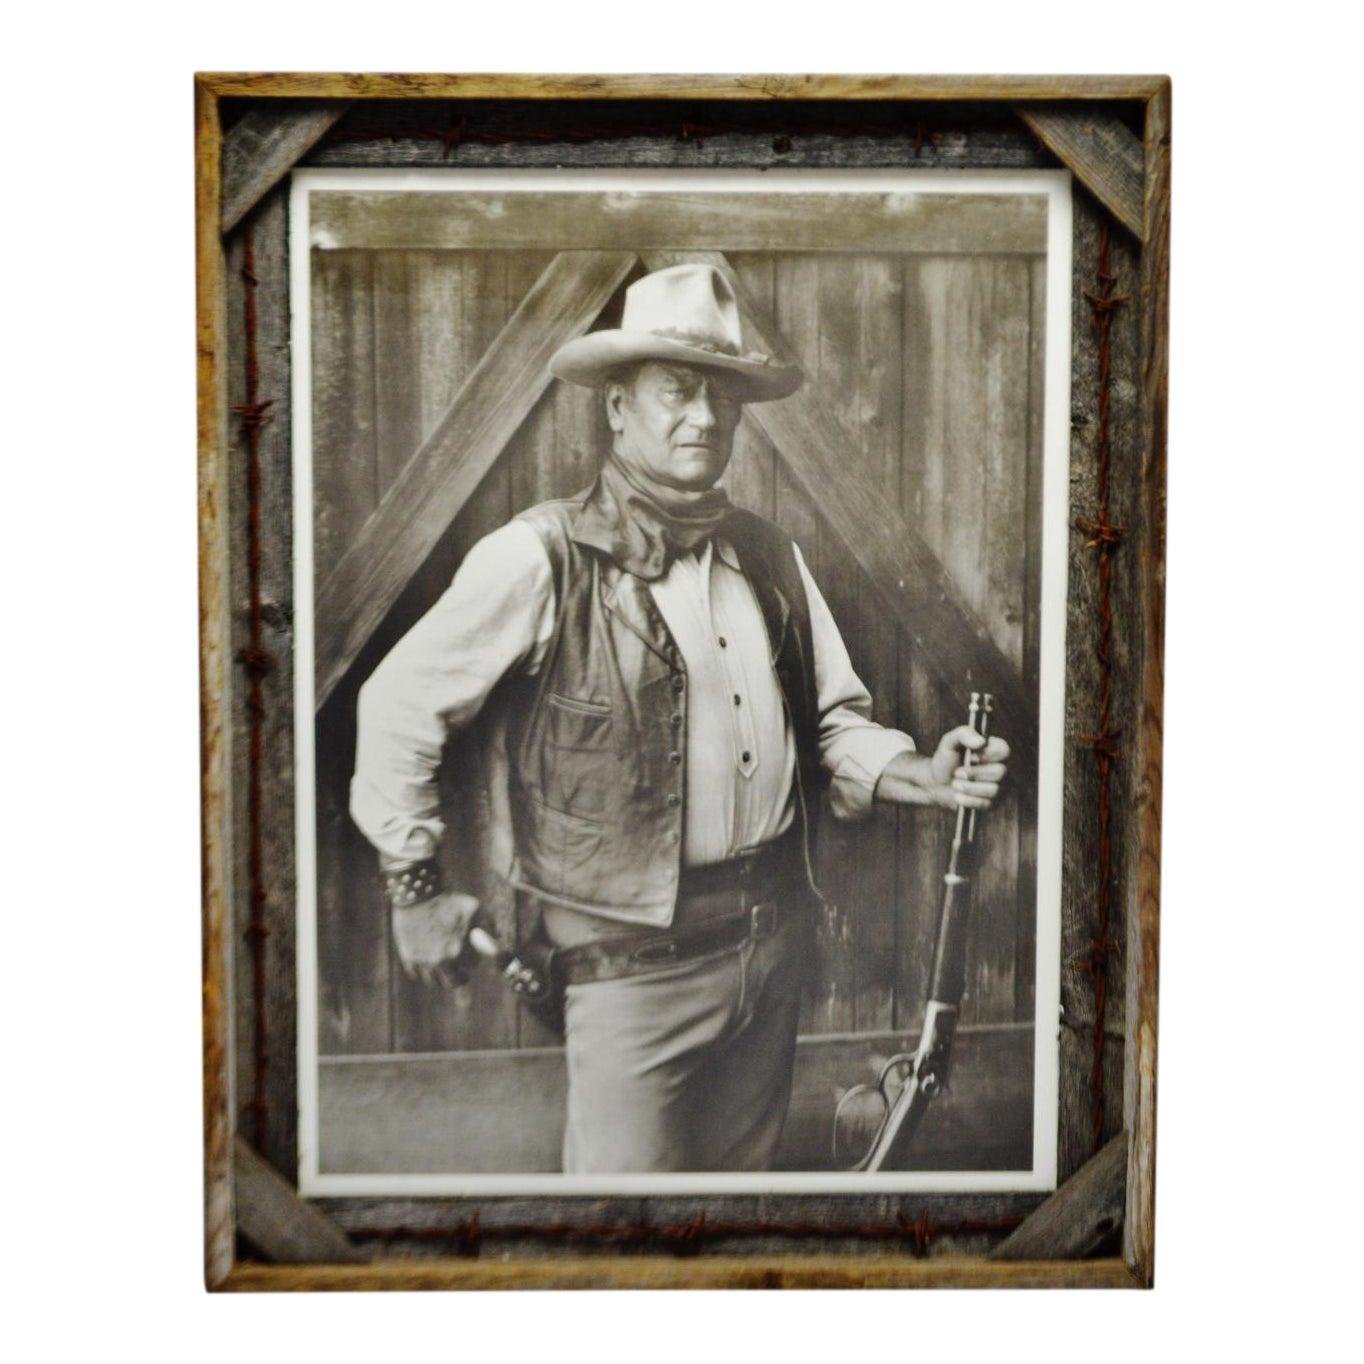 Vintage John Wayne Print With Rustic Barn Wood and Barb Wire Frame ...